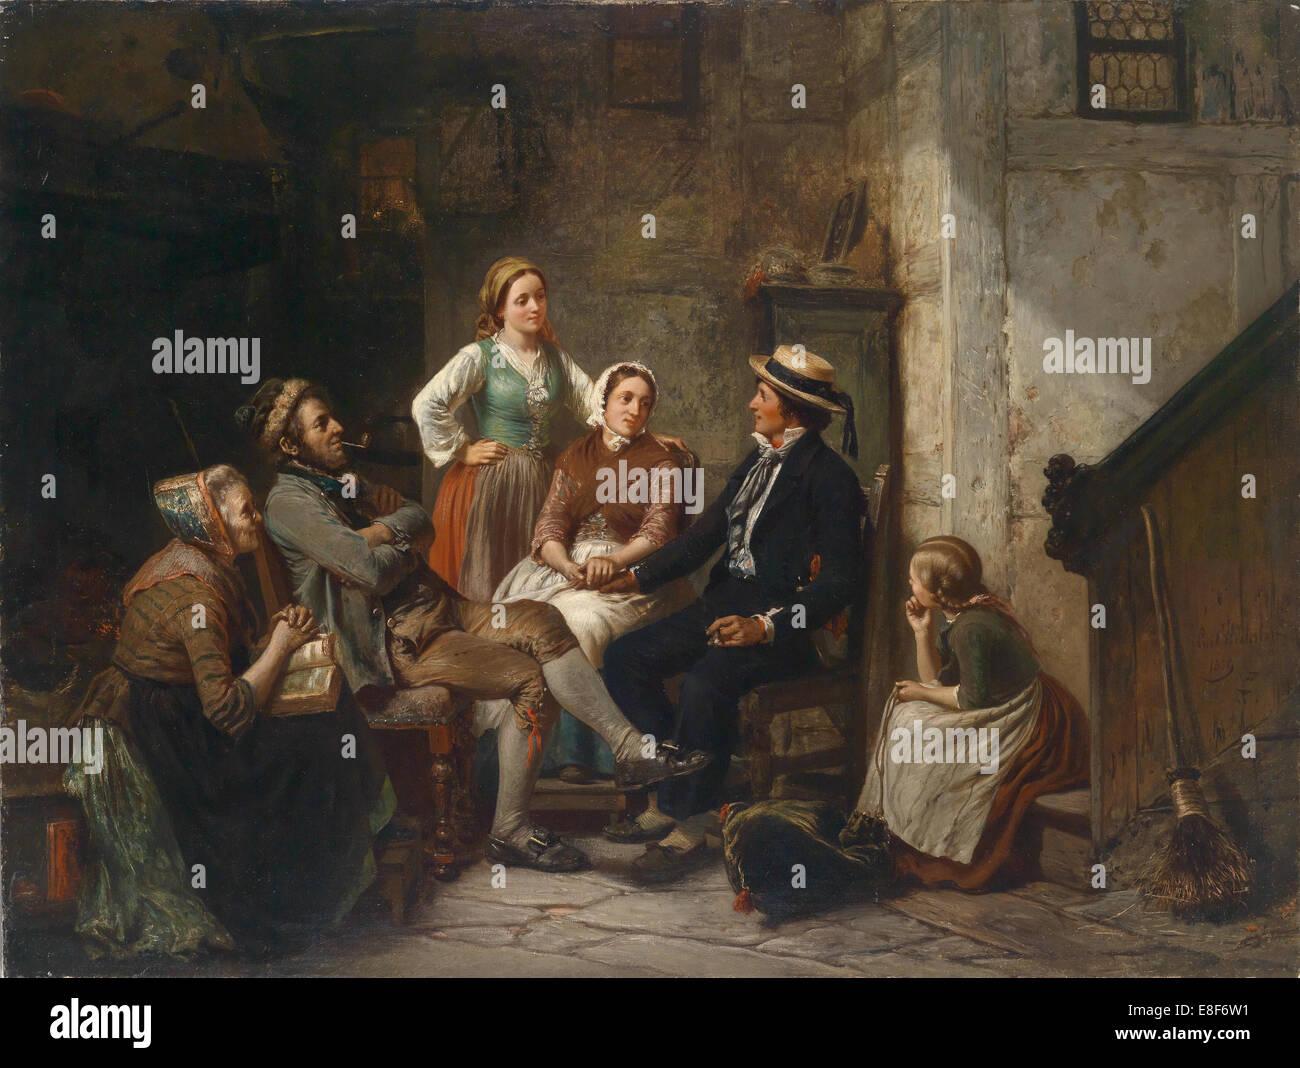 Return of the young sailor. Artist: Huebner, Carl Wilhelm (1814-1879) - Stock Image